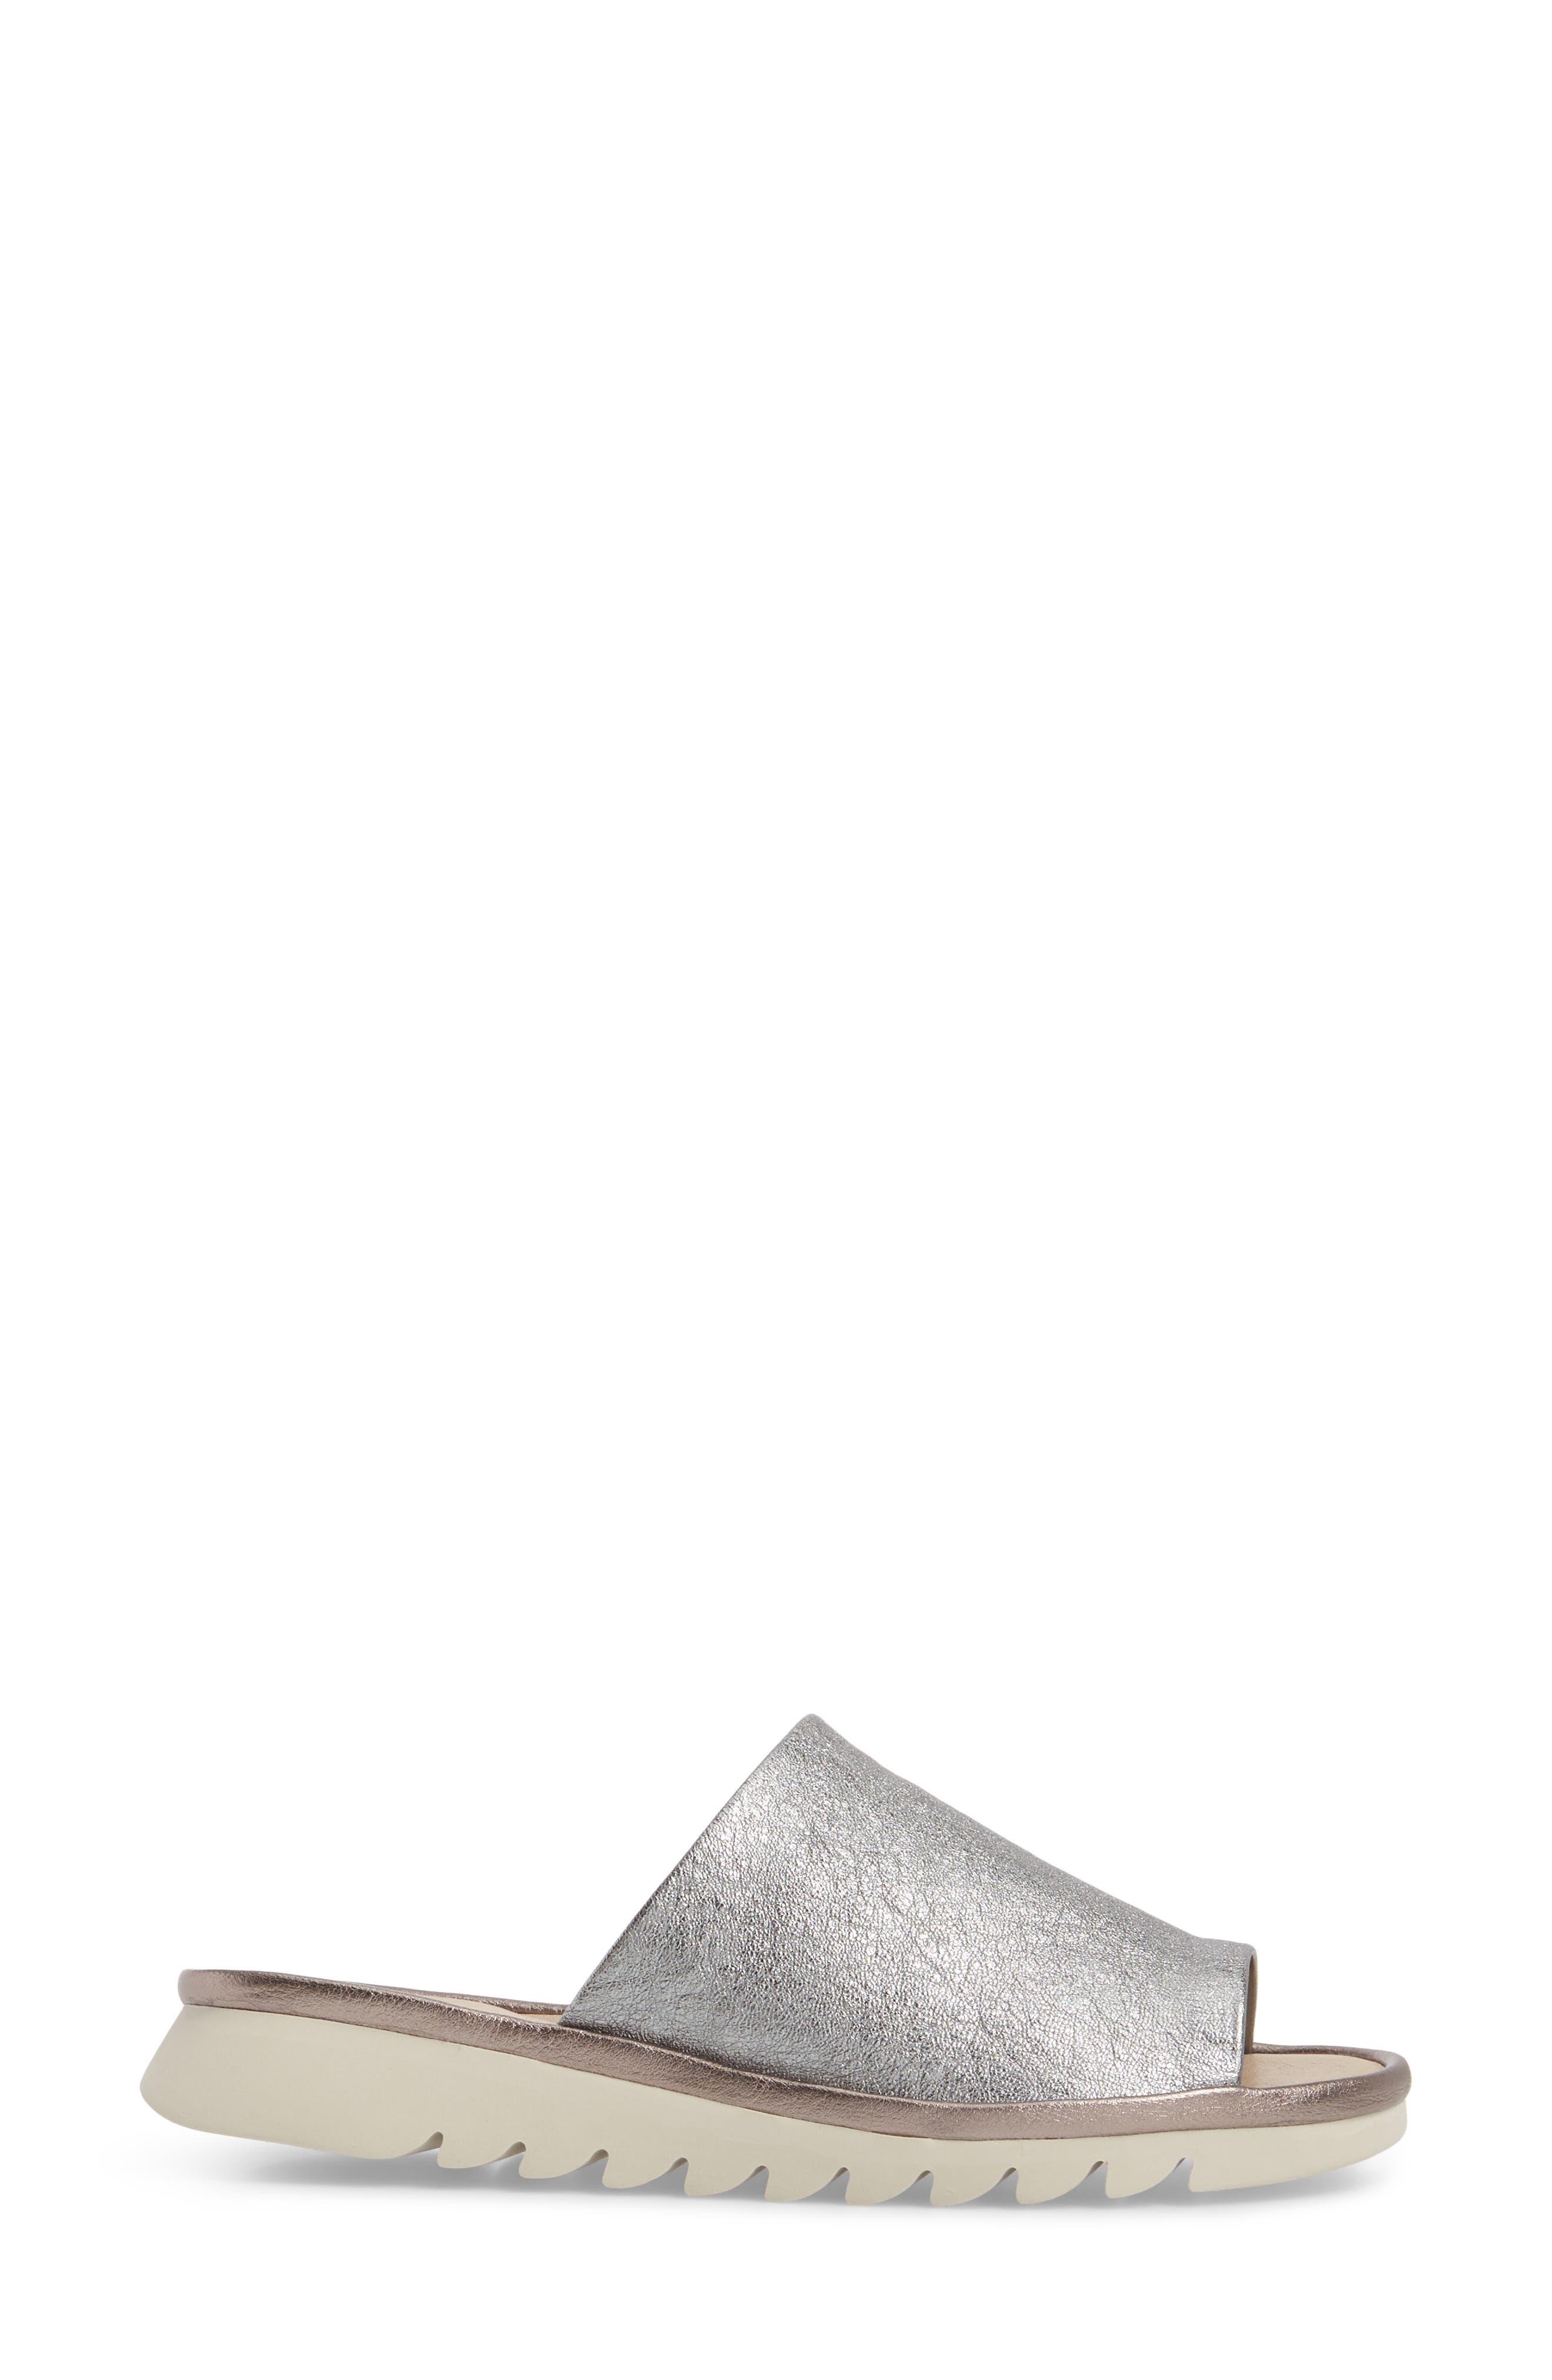 ,                             Shore Thing Slide Sandal,                             Alternate thumbnail 3, color,                             CANNA DI FUCILE LEATHER